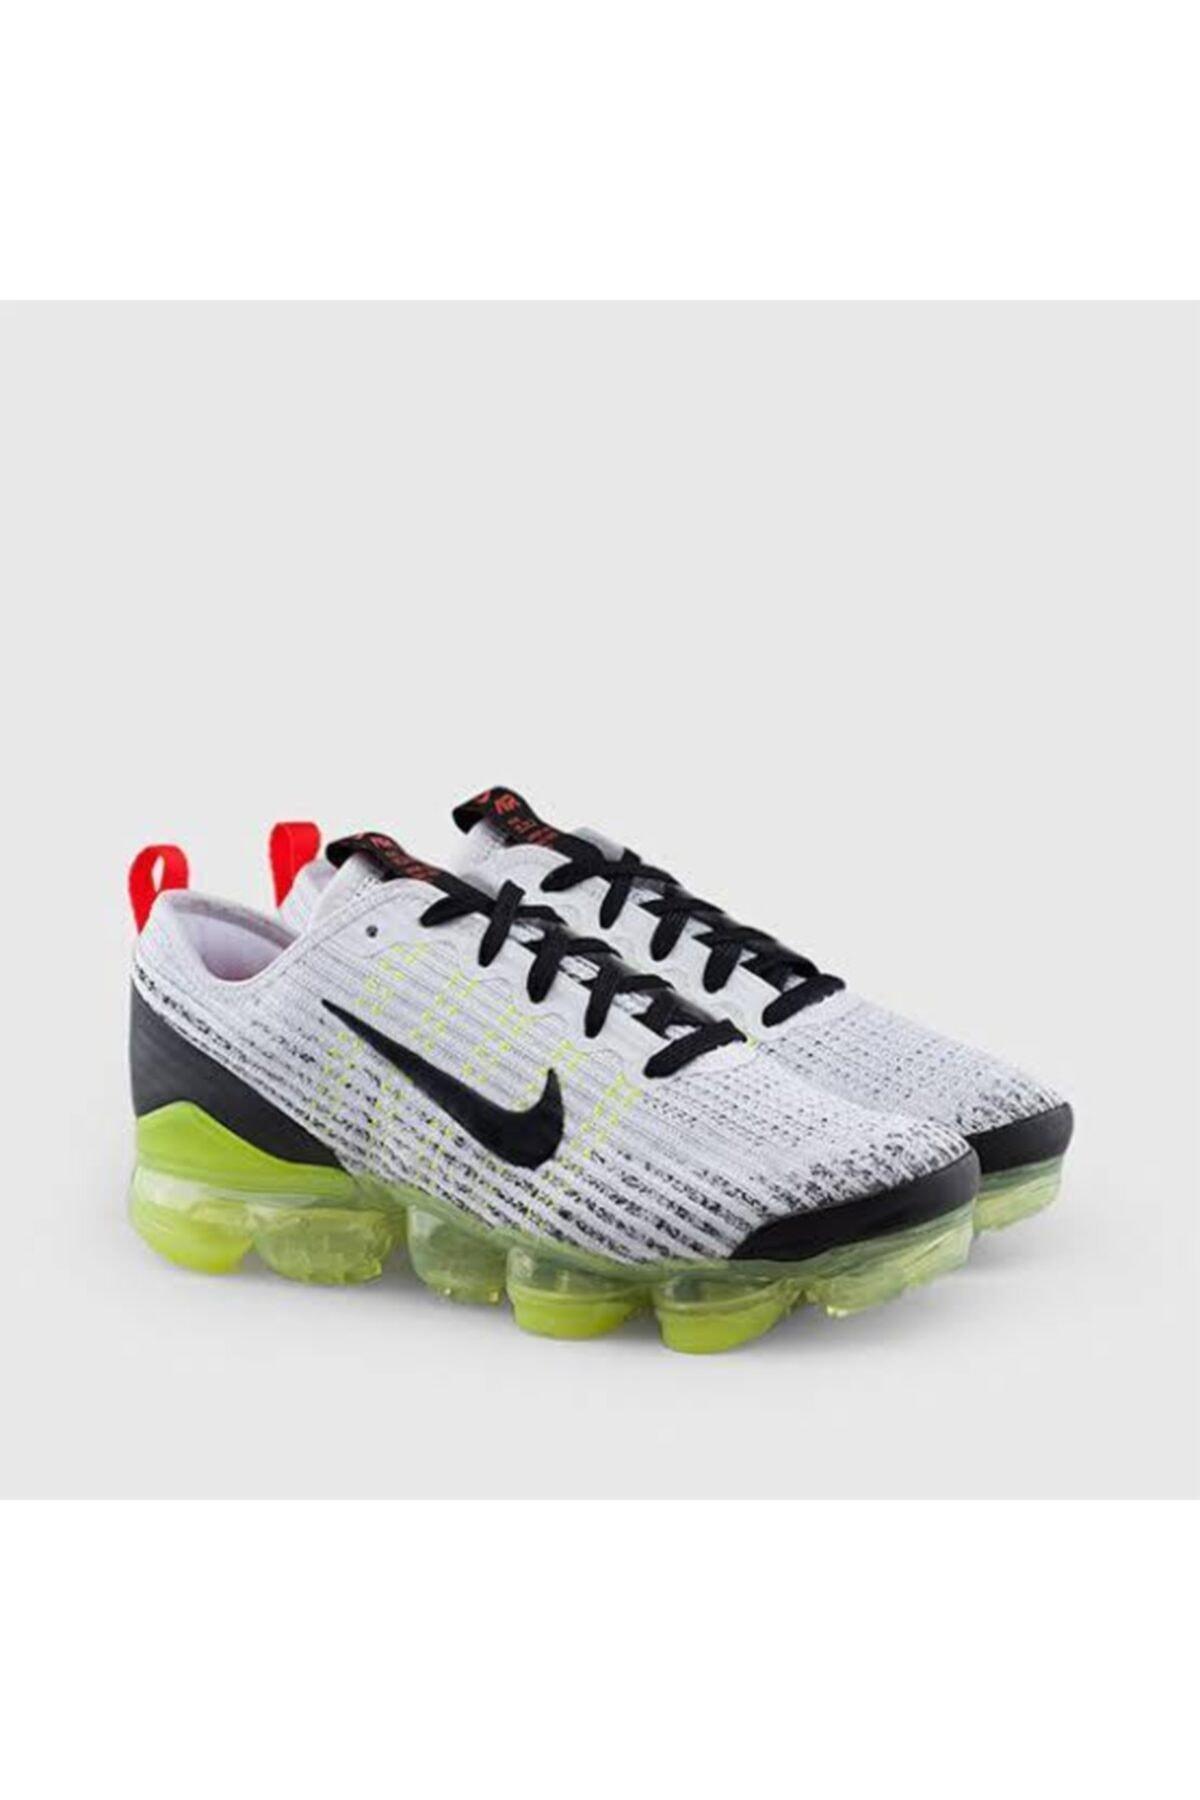 Nike Air Vapormax Flyknit 3 Gs 'white Volt' - - Bq5238 100 2